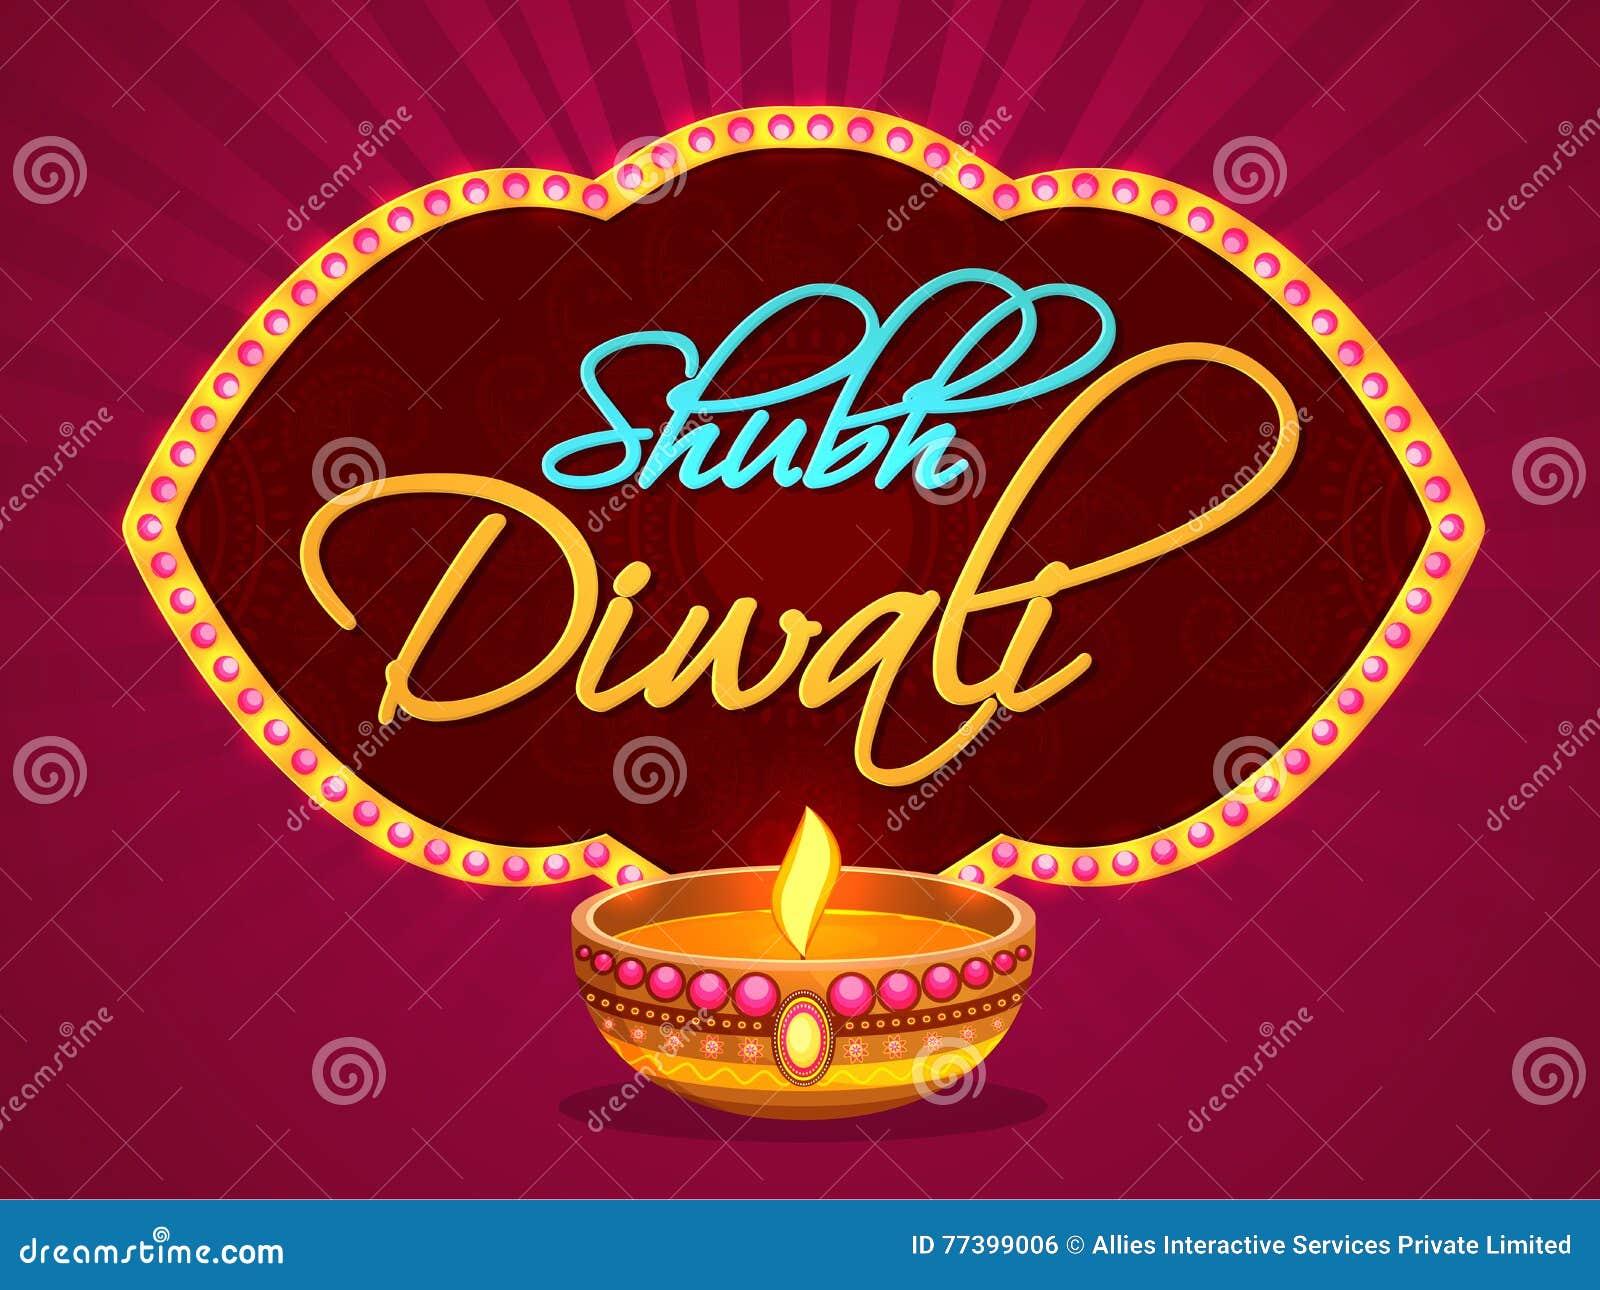 why is diwali celebrated in hindi